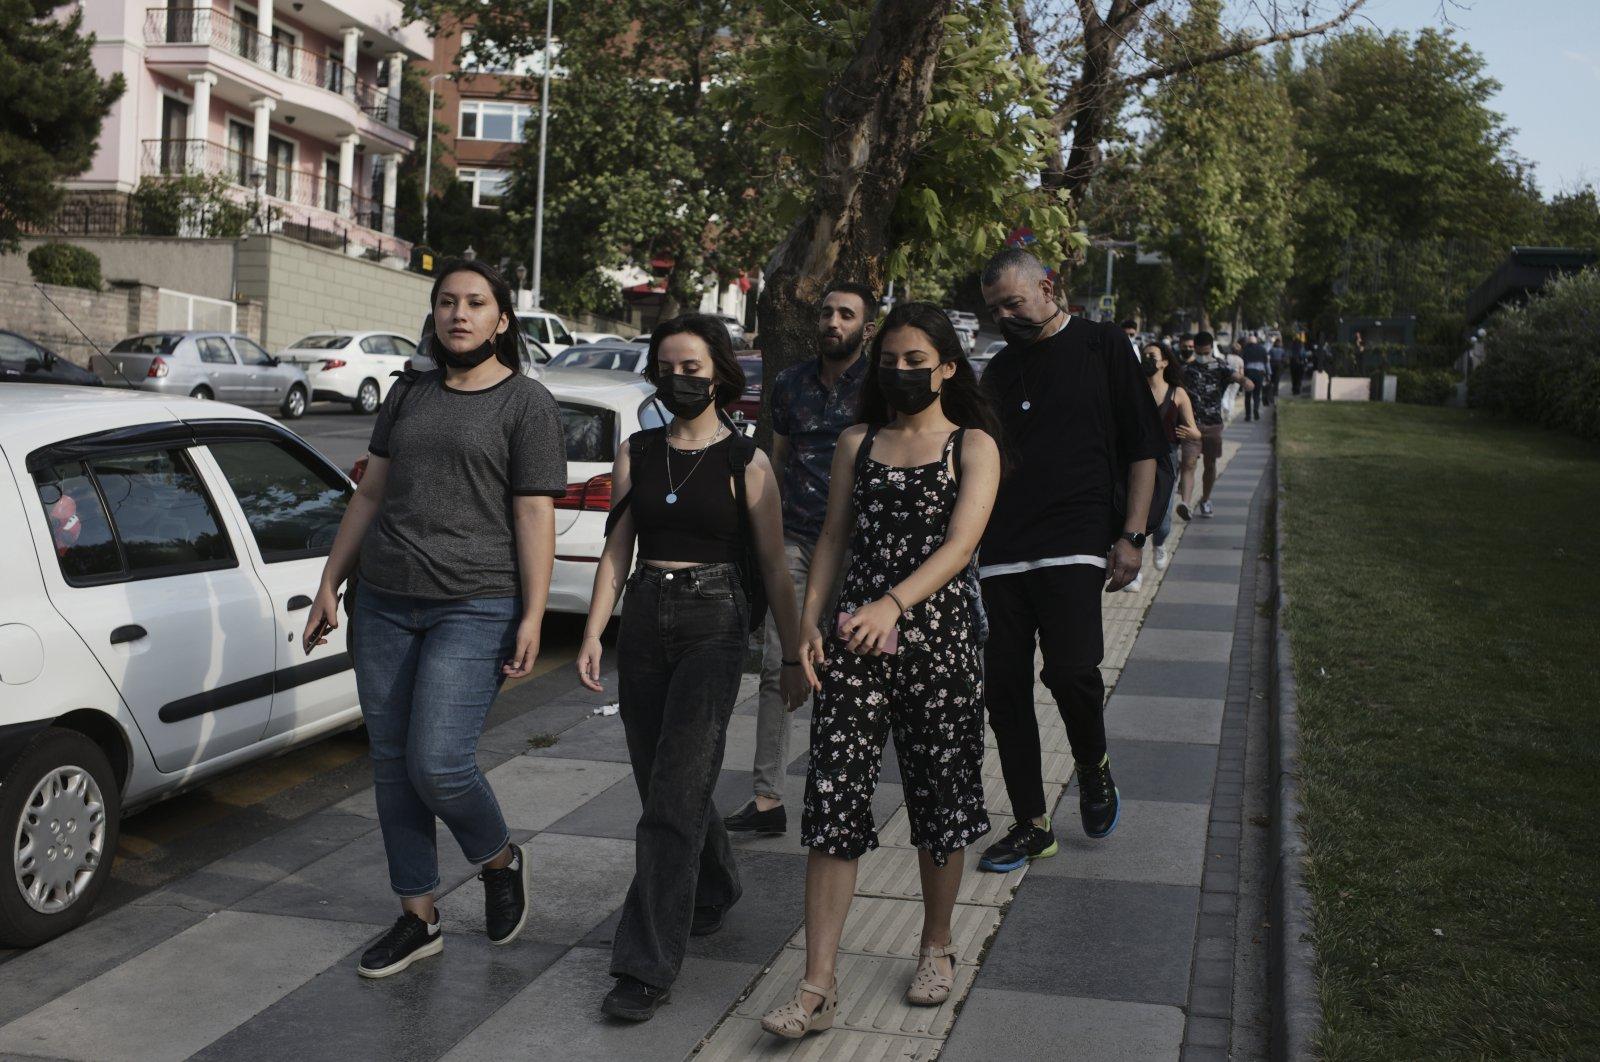 People wearing masks to help protect against the spread of coronavirus, walk along a street, in Ankara, Turkey, July 10, 2021. (AP Photo)